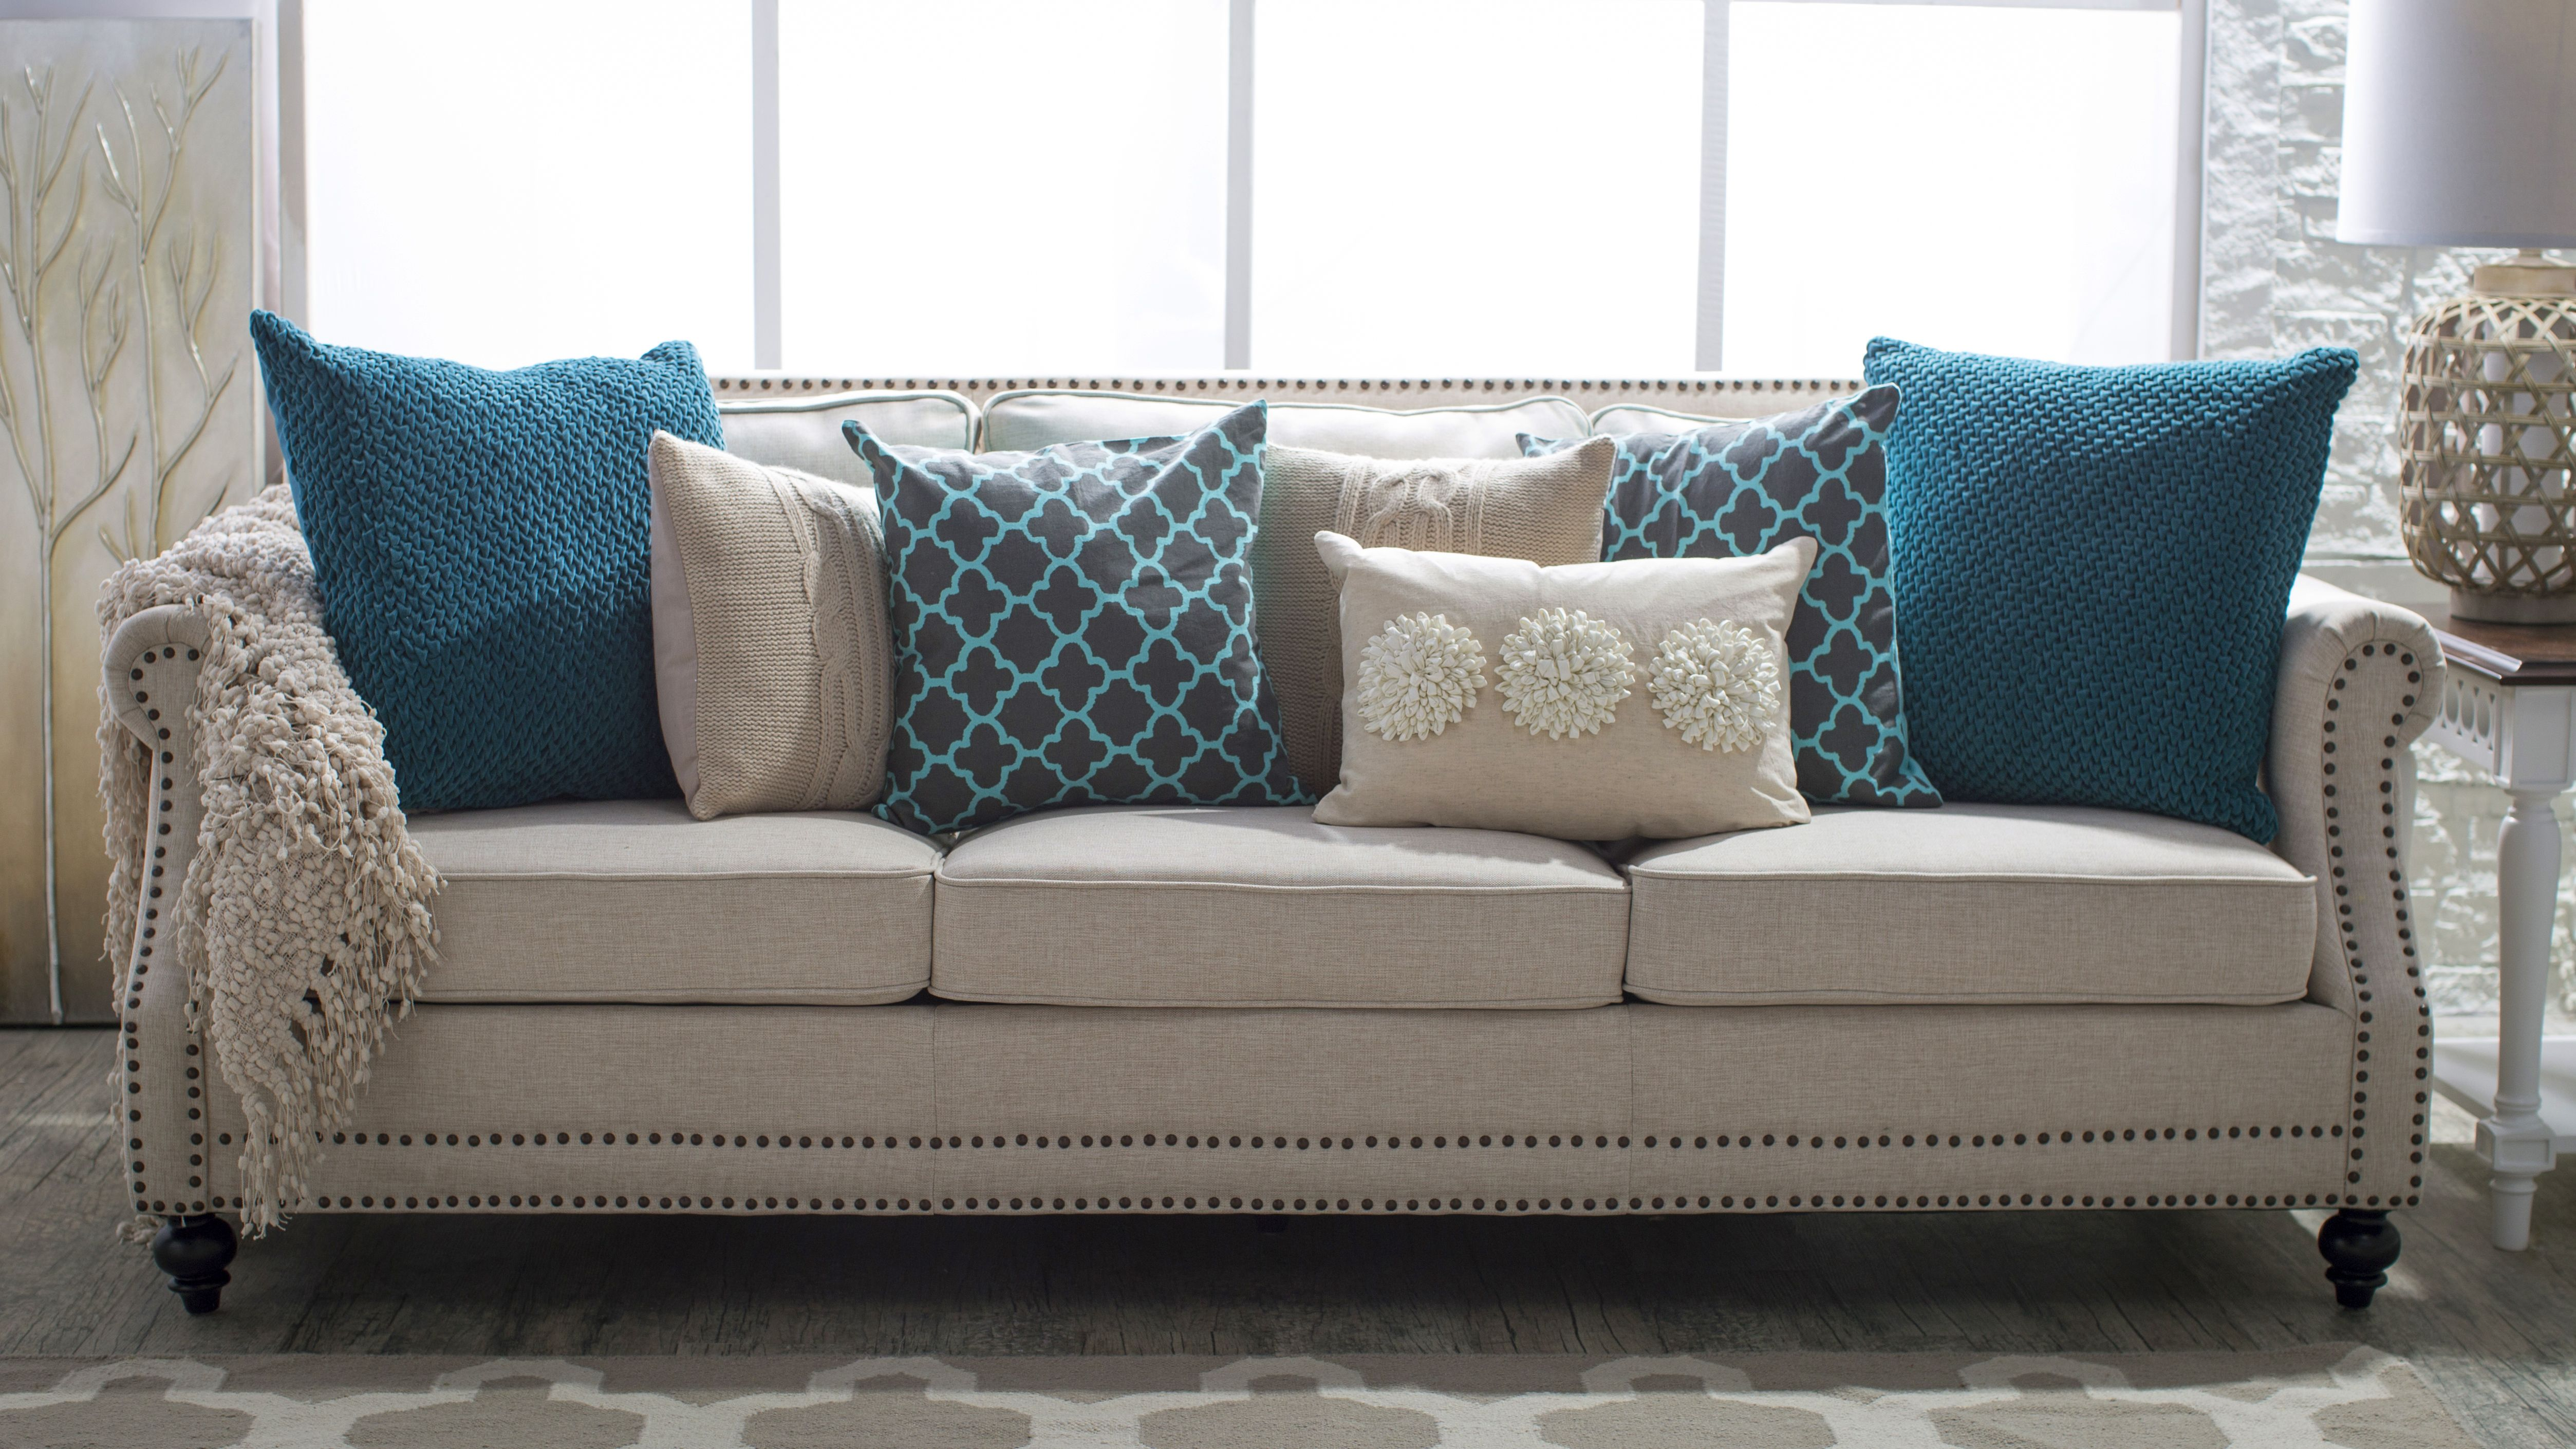 neutral sofa with throw pillows